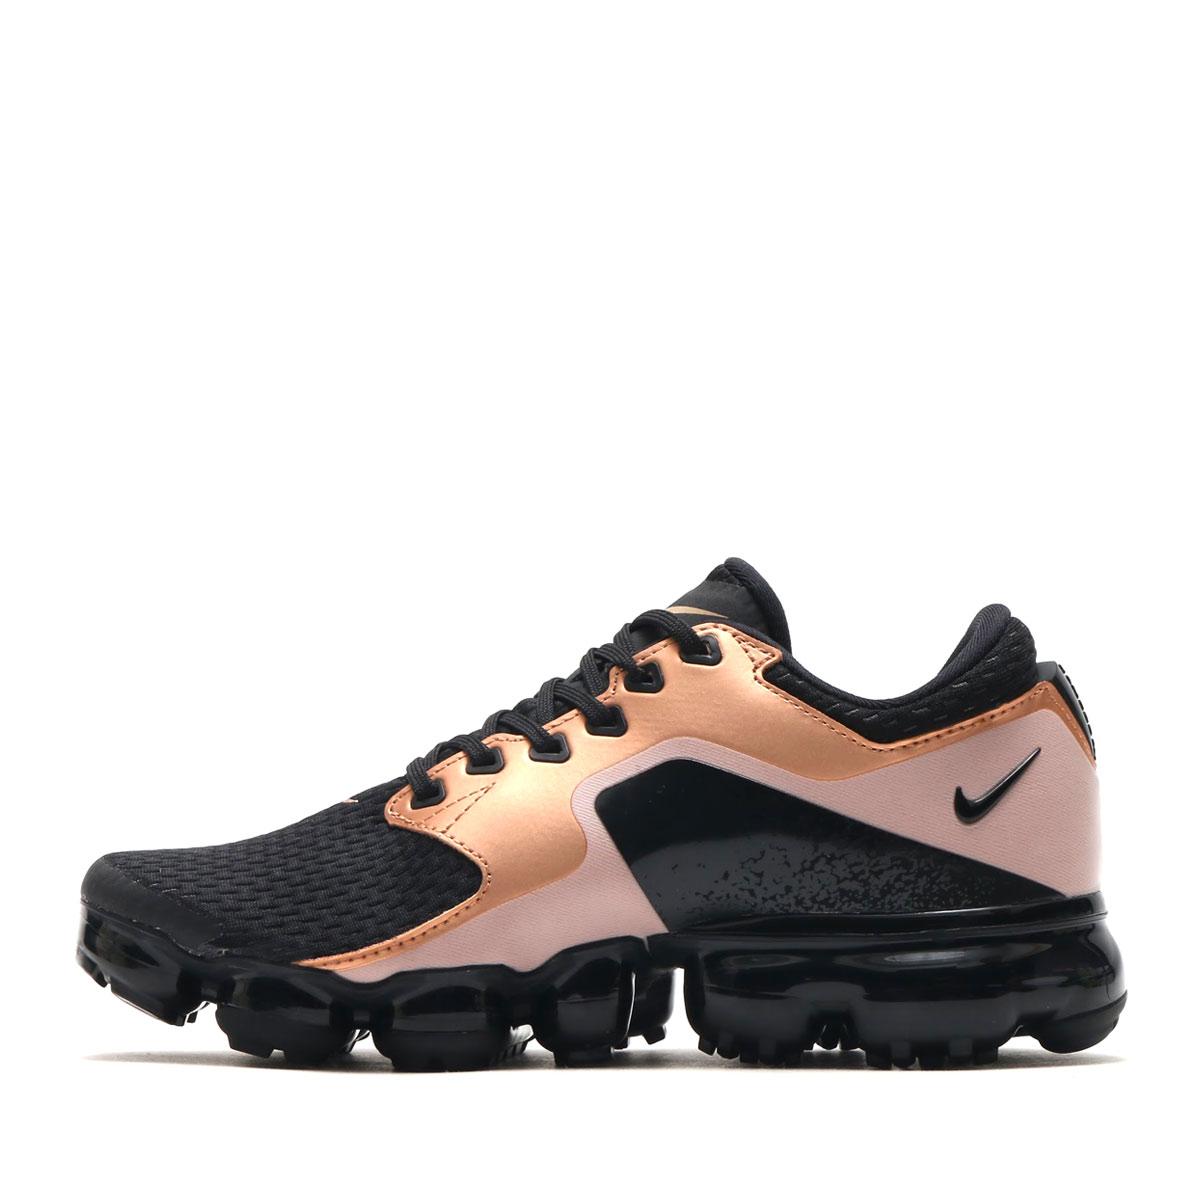 1dbd3a013191 NIKE WMNS AIR VAPORMAX (Nike women air vapor max) (BLACK BLACK-BLACK-MTLC  RED BRONZE) 17HO-S